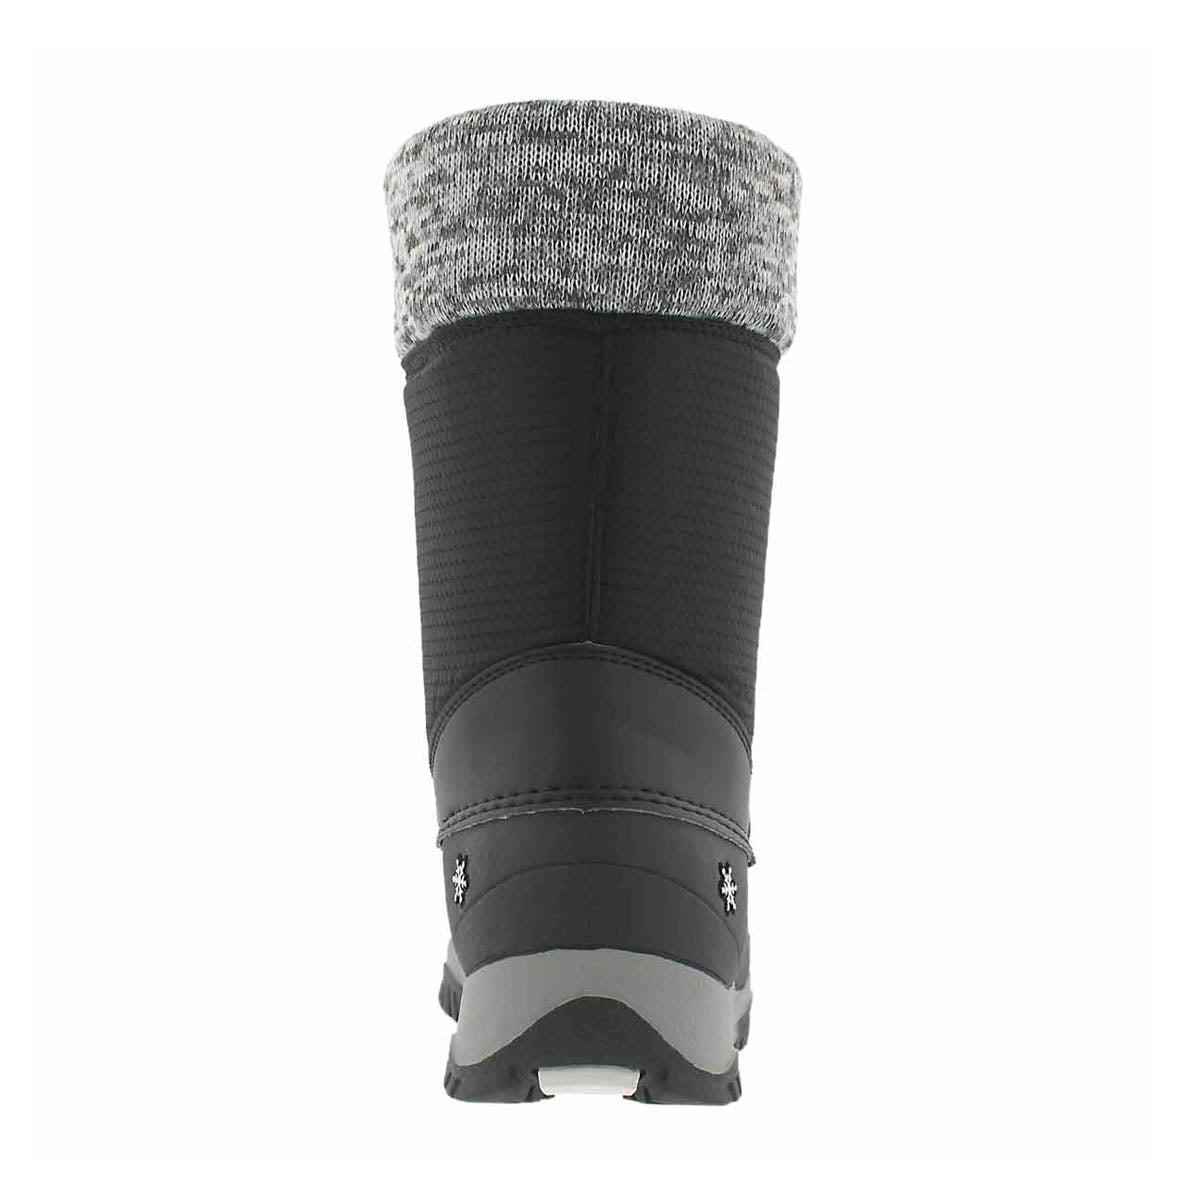 Grls Avery black wtpf winter boot